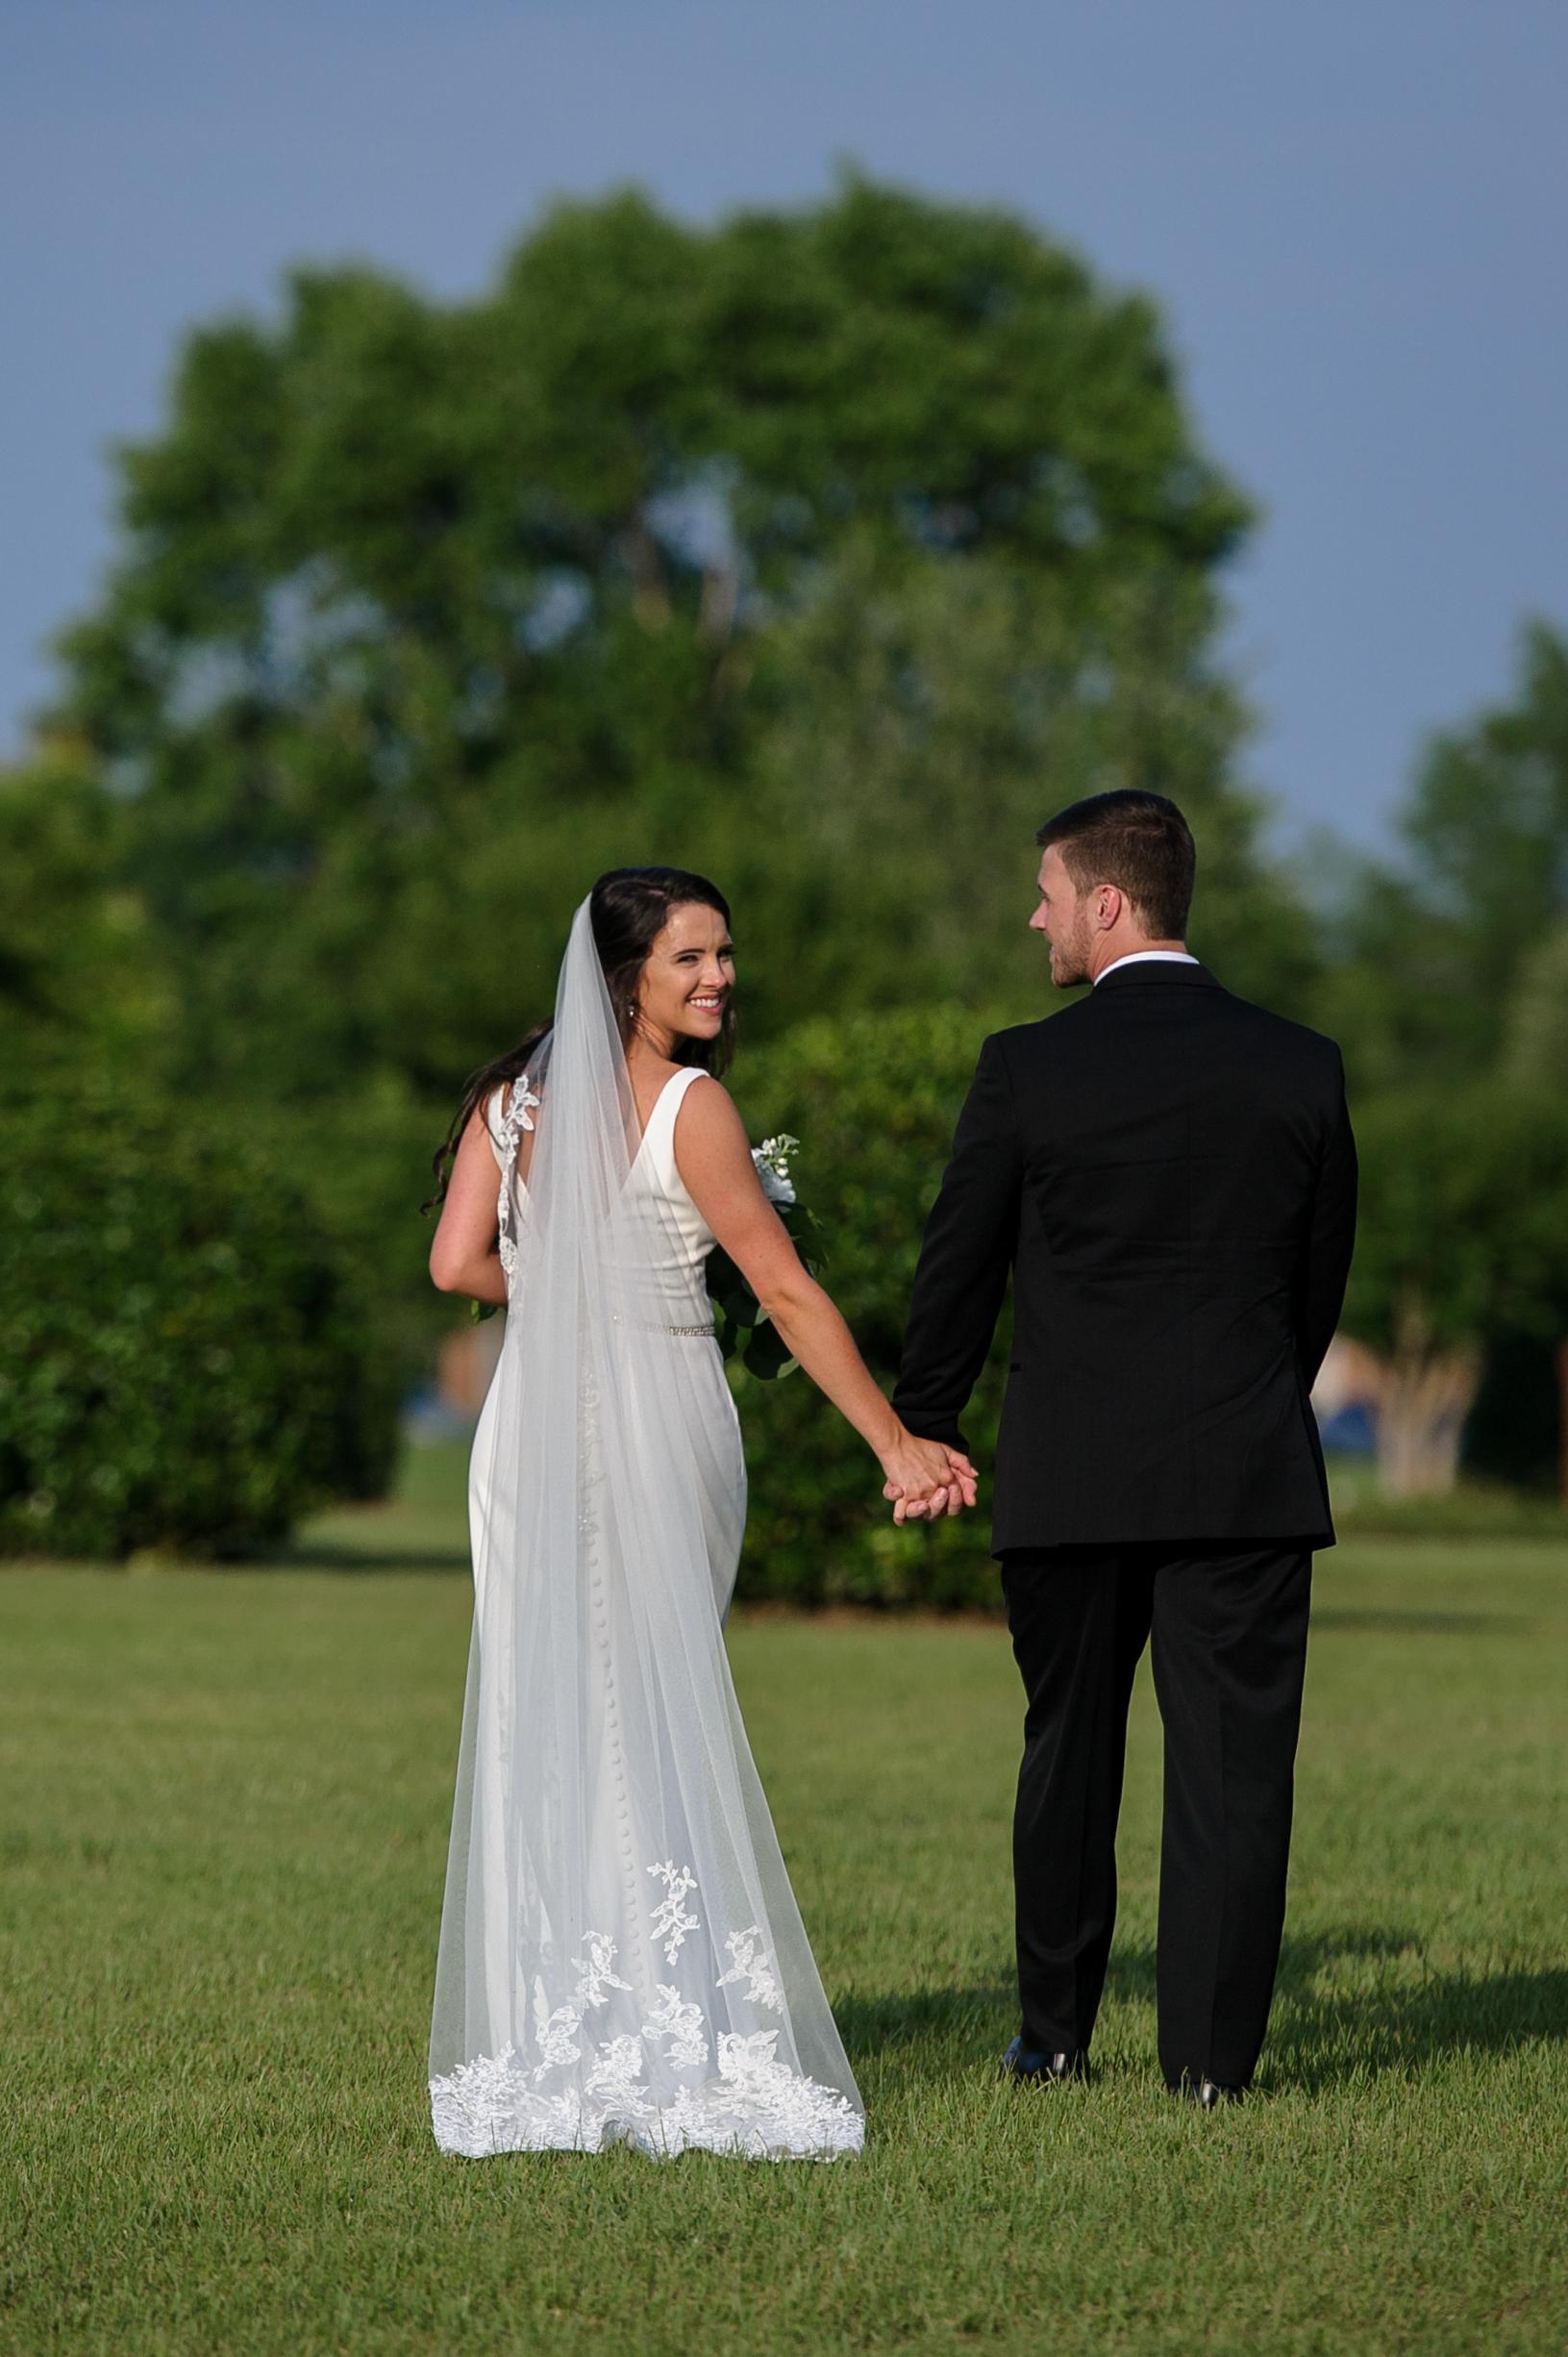 Royal Wedding with Outdoor Reception-42.JPG